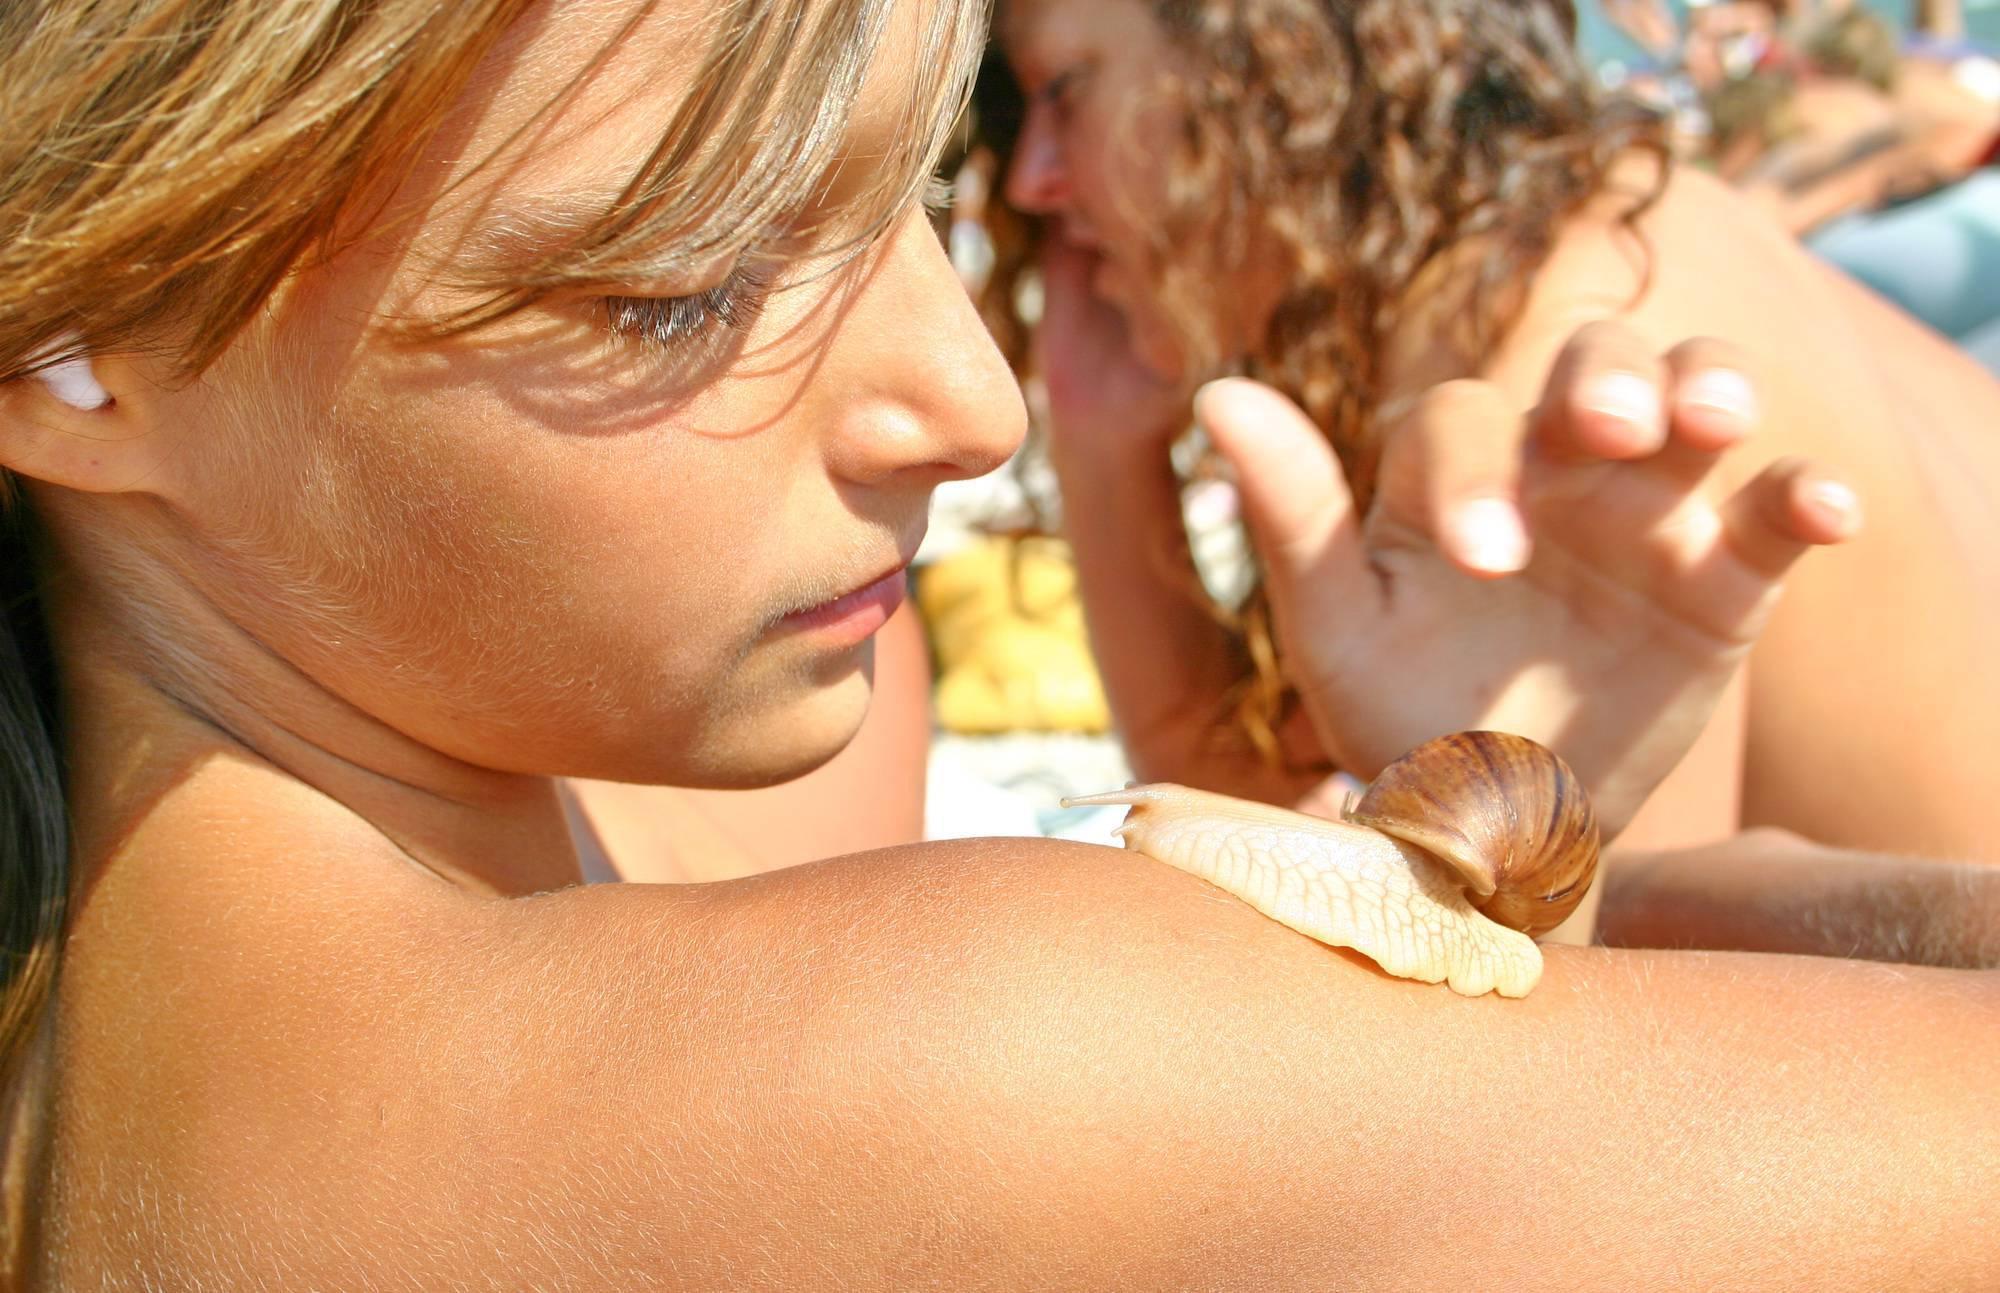 Ulitka Play On the Beach - 2